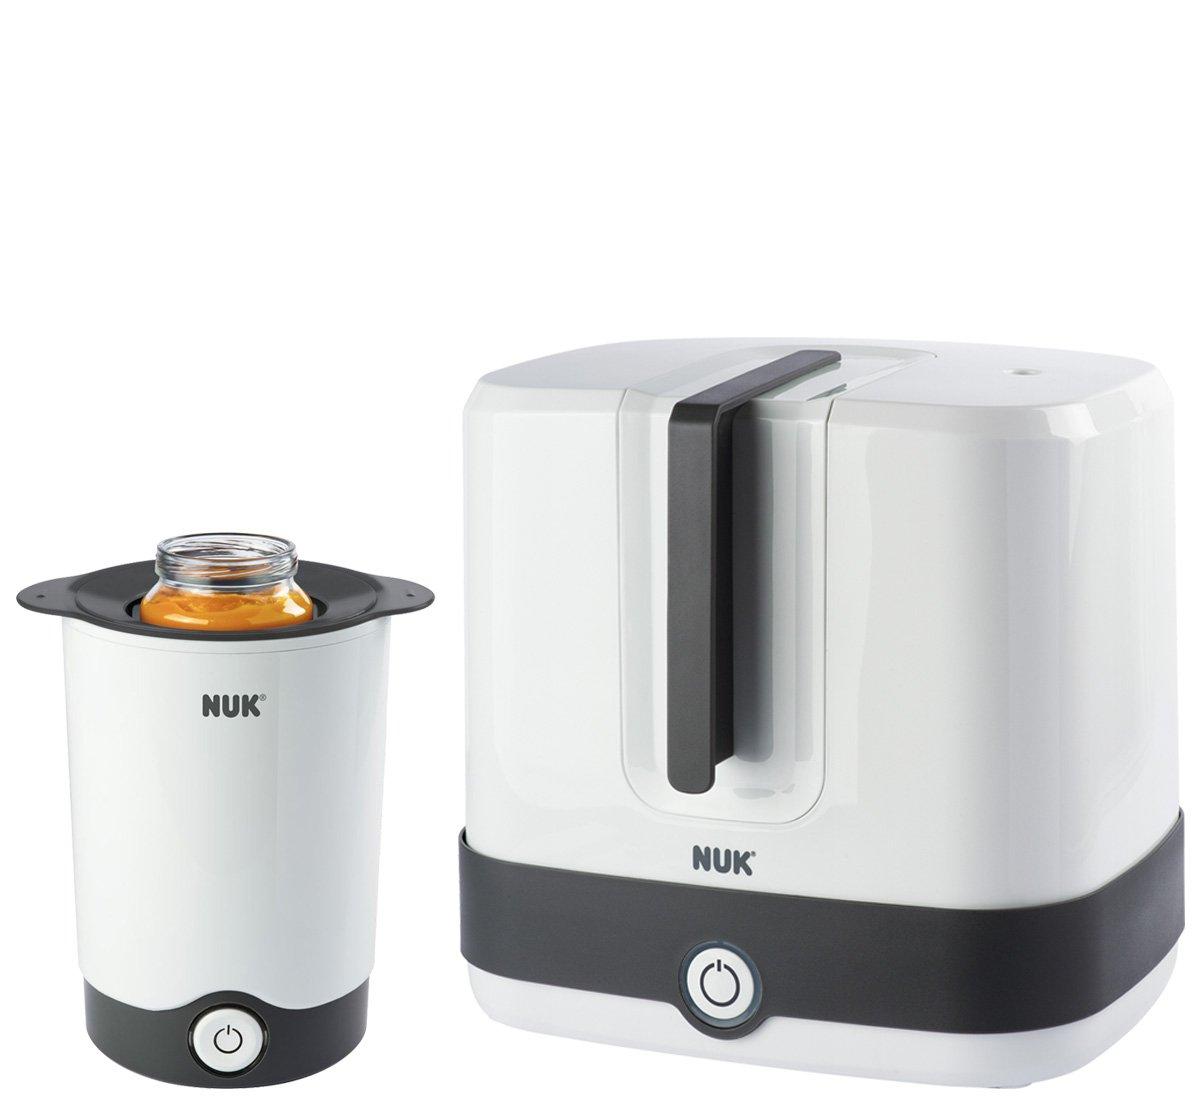 NUK Vario Express Dampf-Sterilisator, mit Multi Dry Trockenständer und Nature Sense Start Set